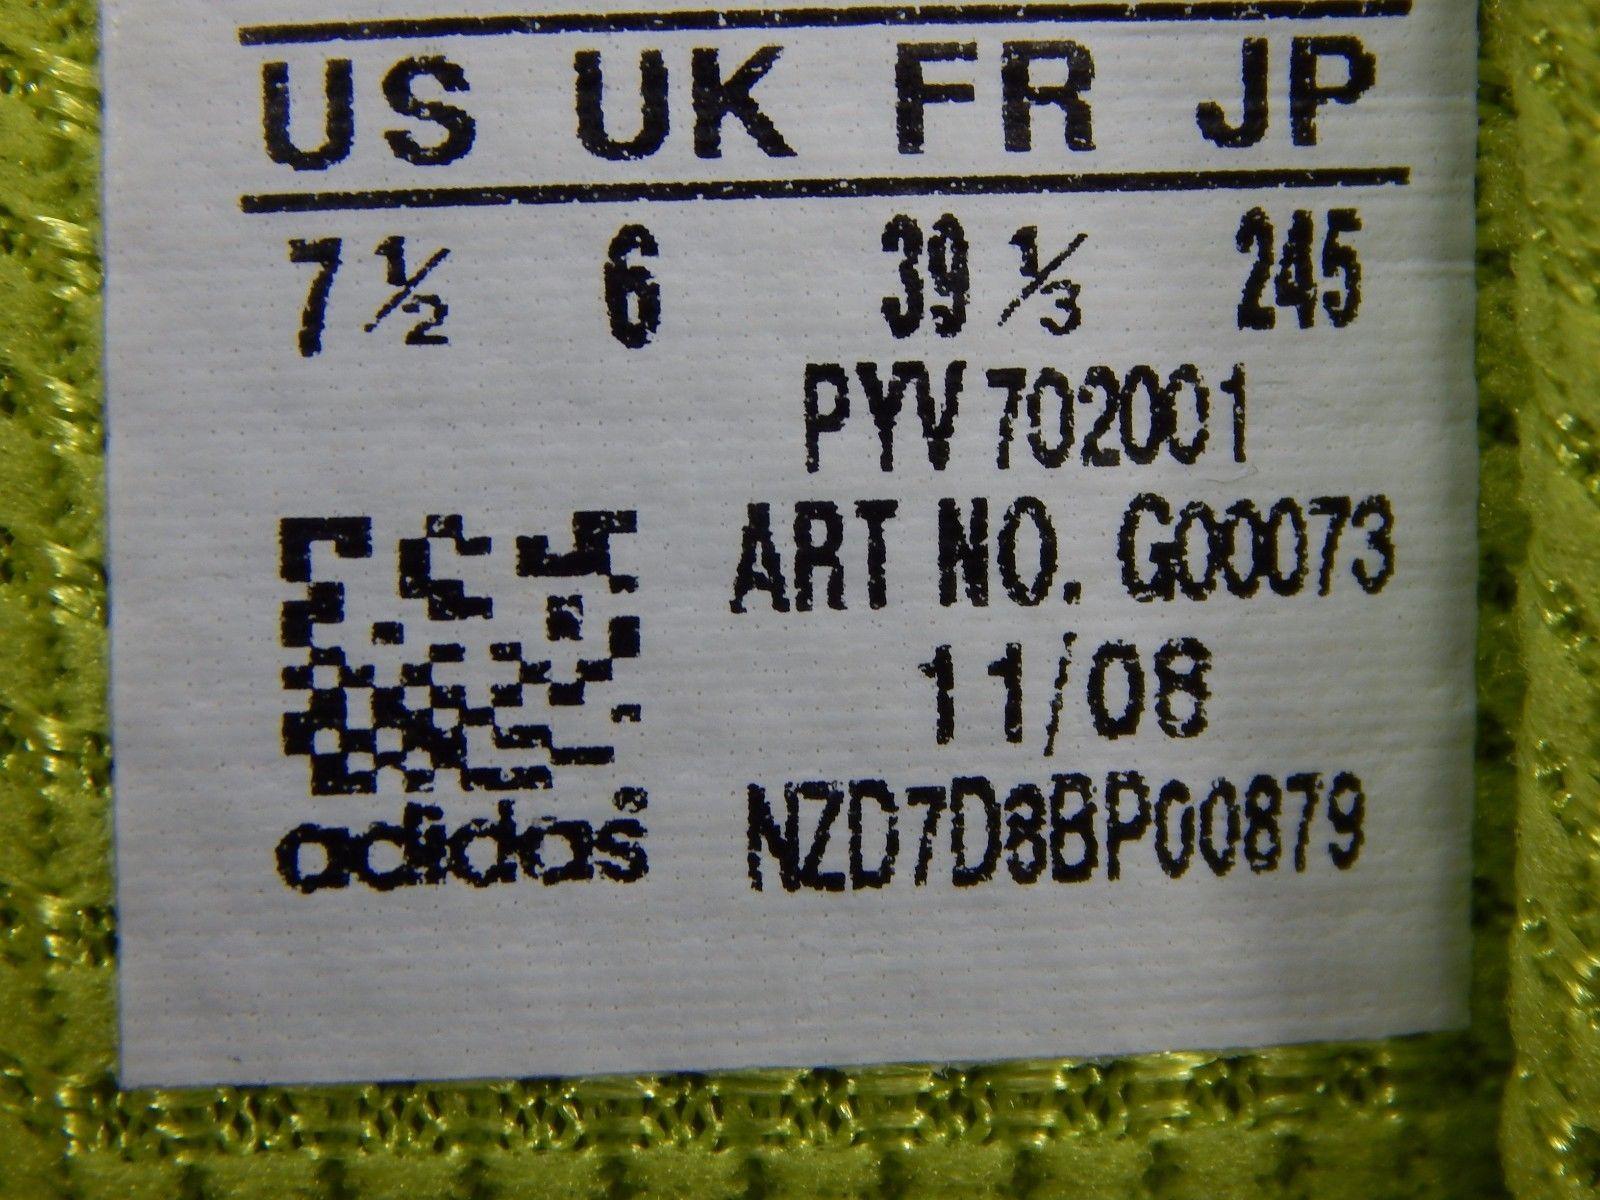 Adidas Allegra 2 Women's Running Shoes Size US 7.5 M (B) EU 39 1/3 White G00073